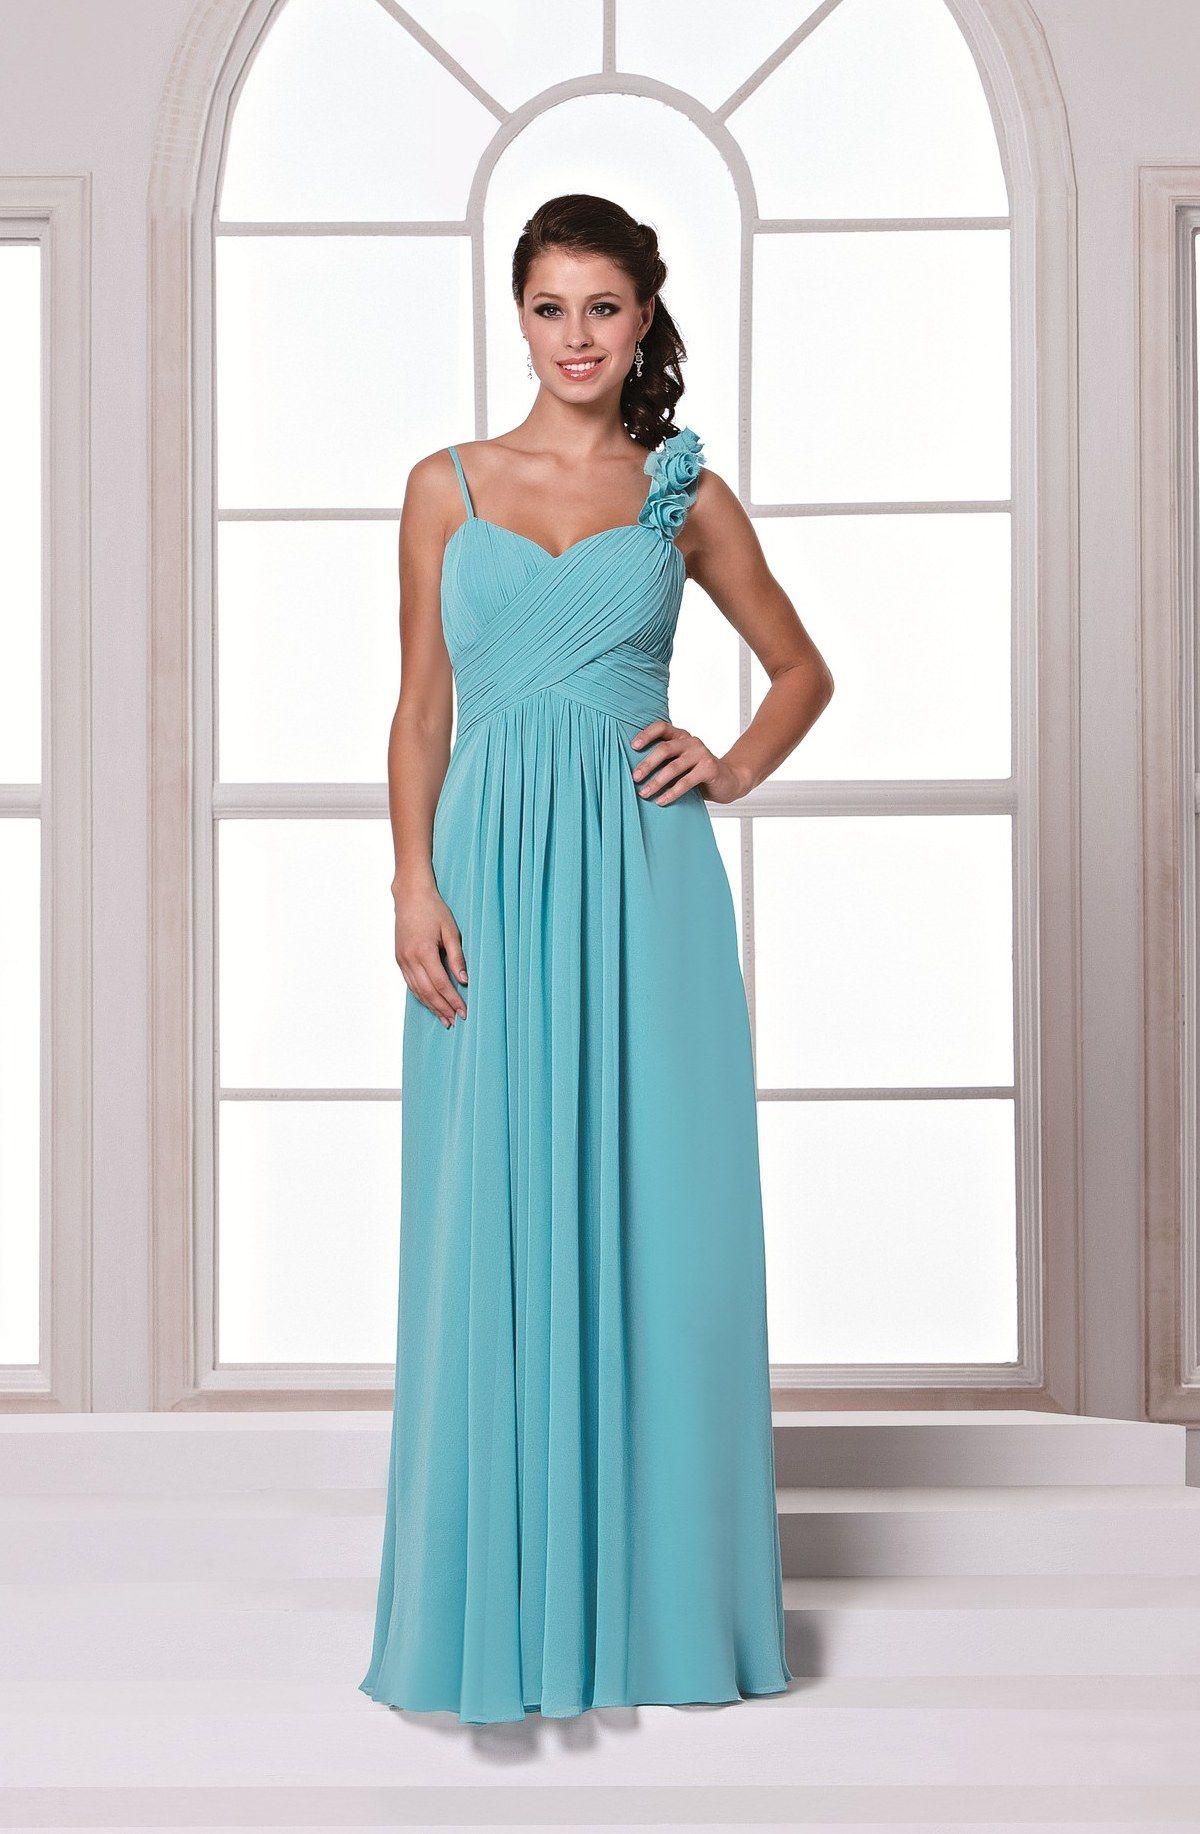 Cute Prom Dress Hire Hull Ideas - Wedding Ideas - memiocall.com